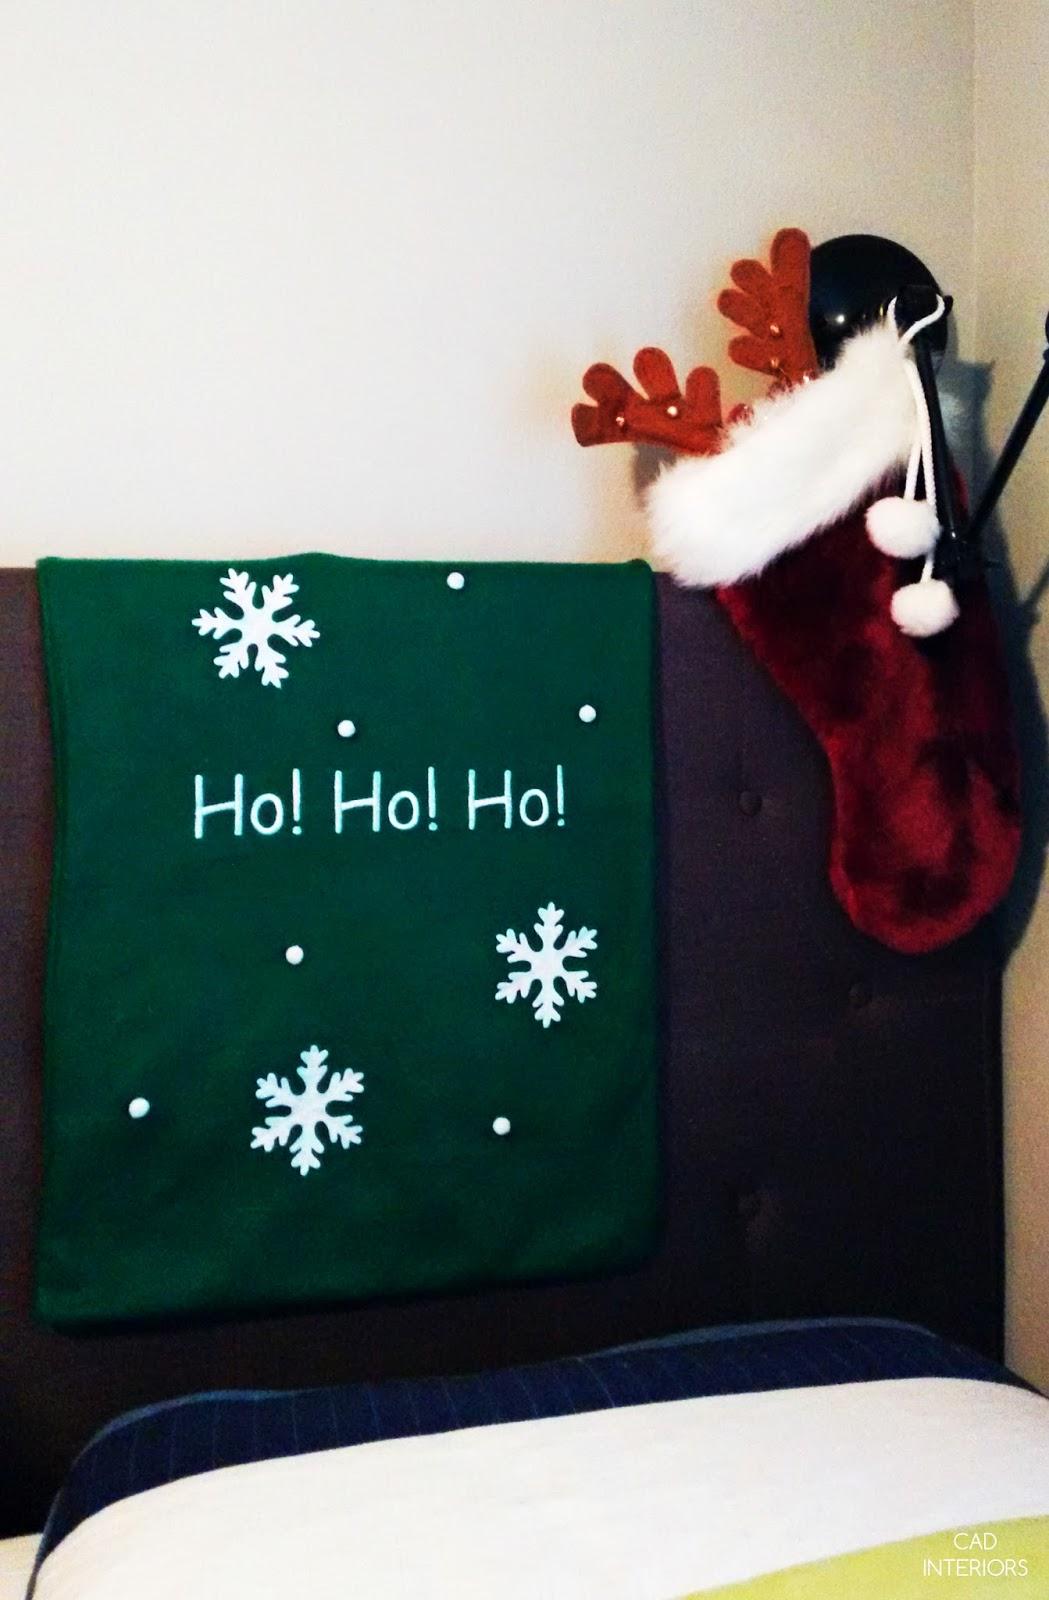 CAD INTERIORS holiday home 2015 Christmas holiday decorating kids bedroom ho ho ho